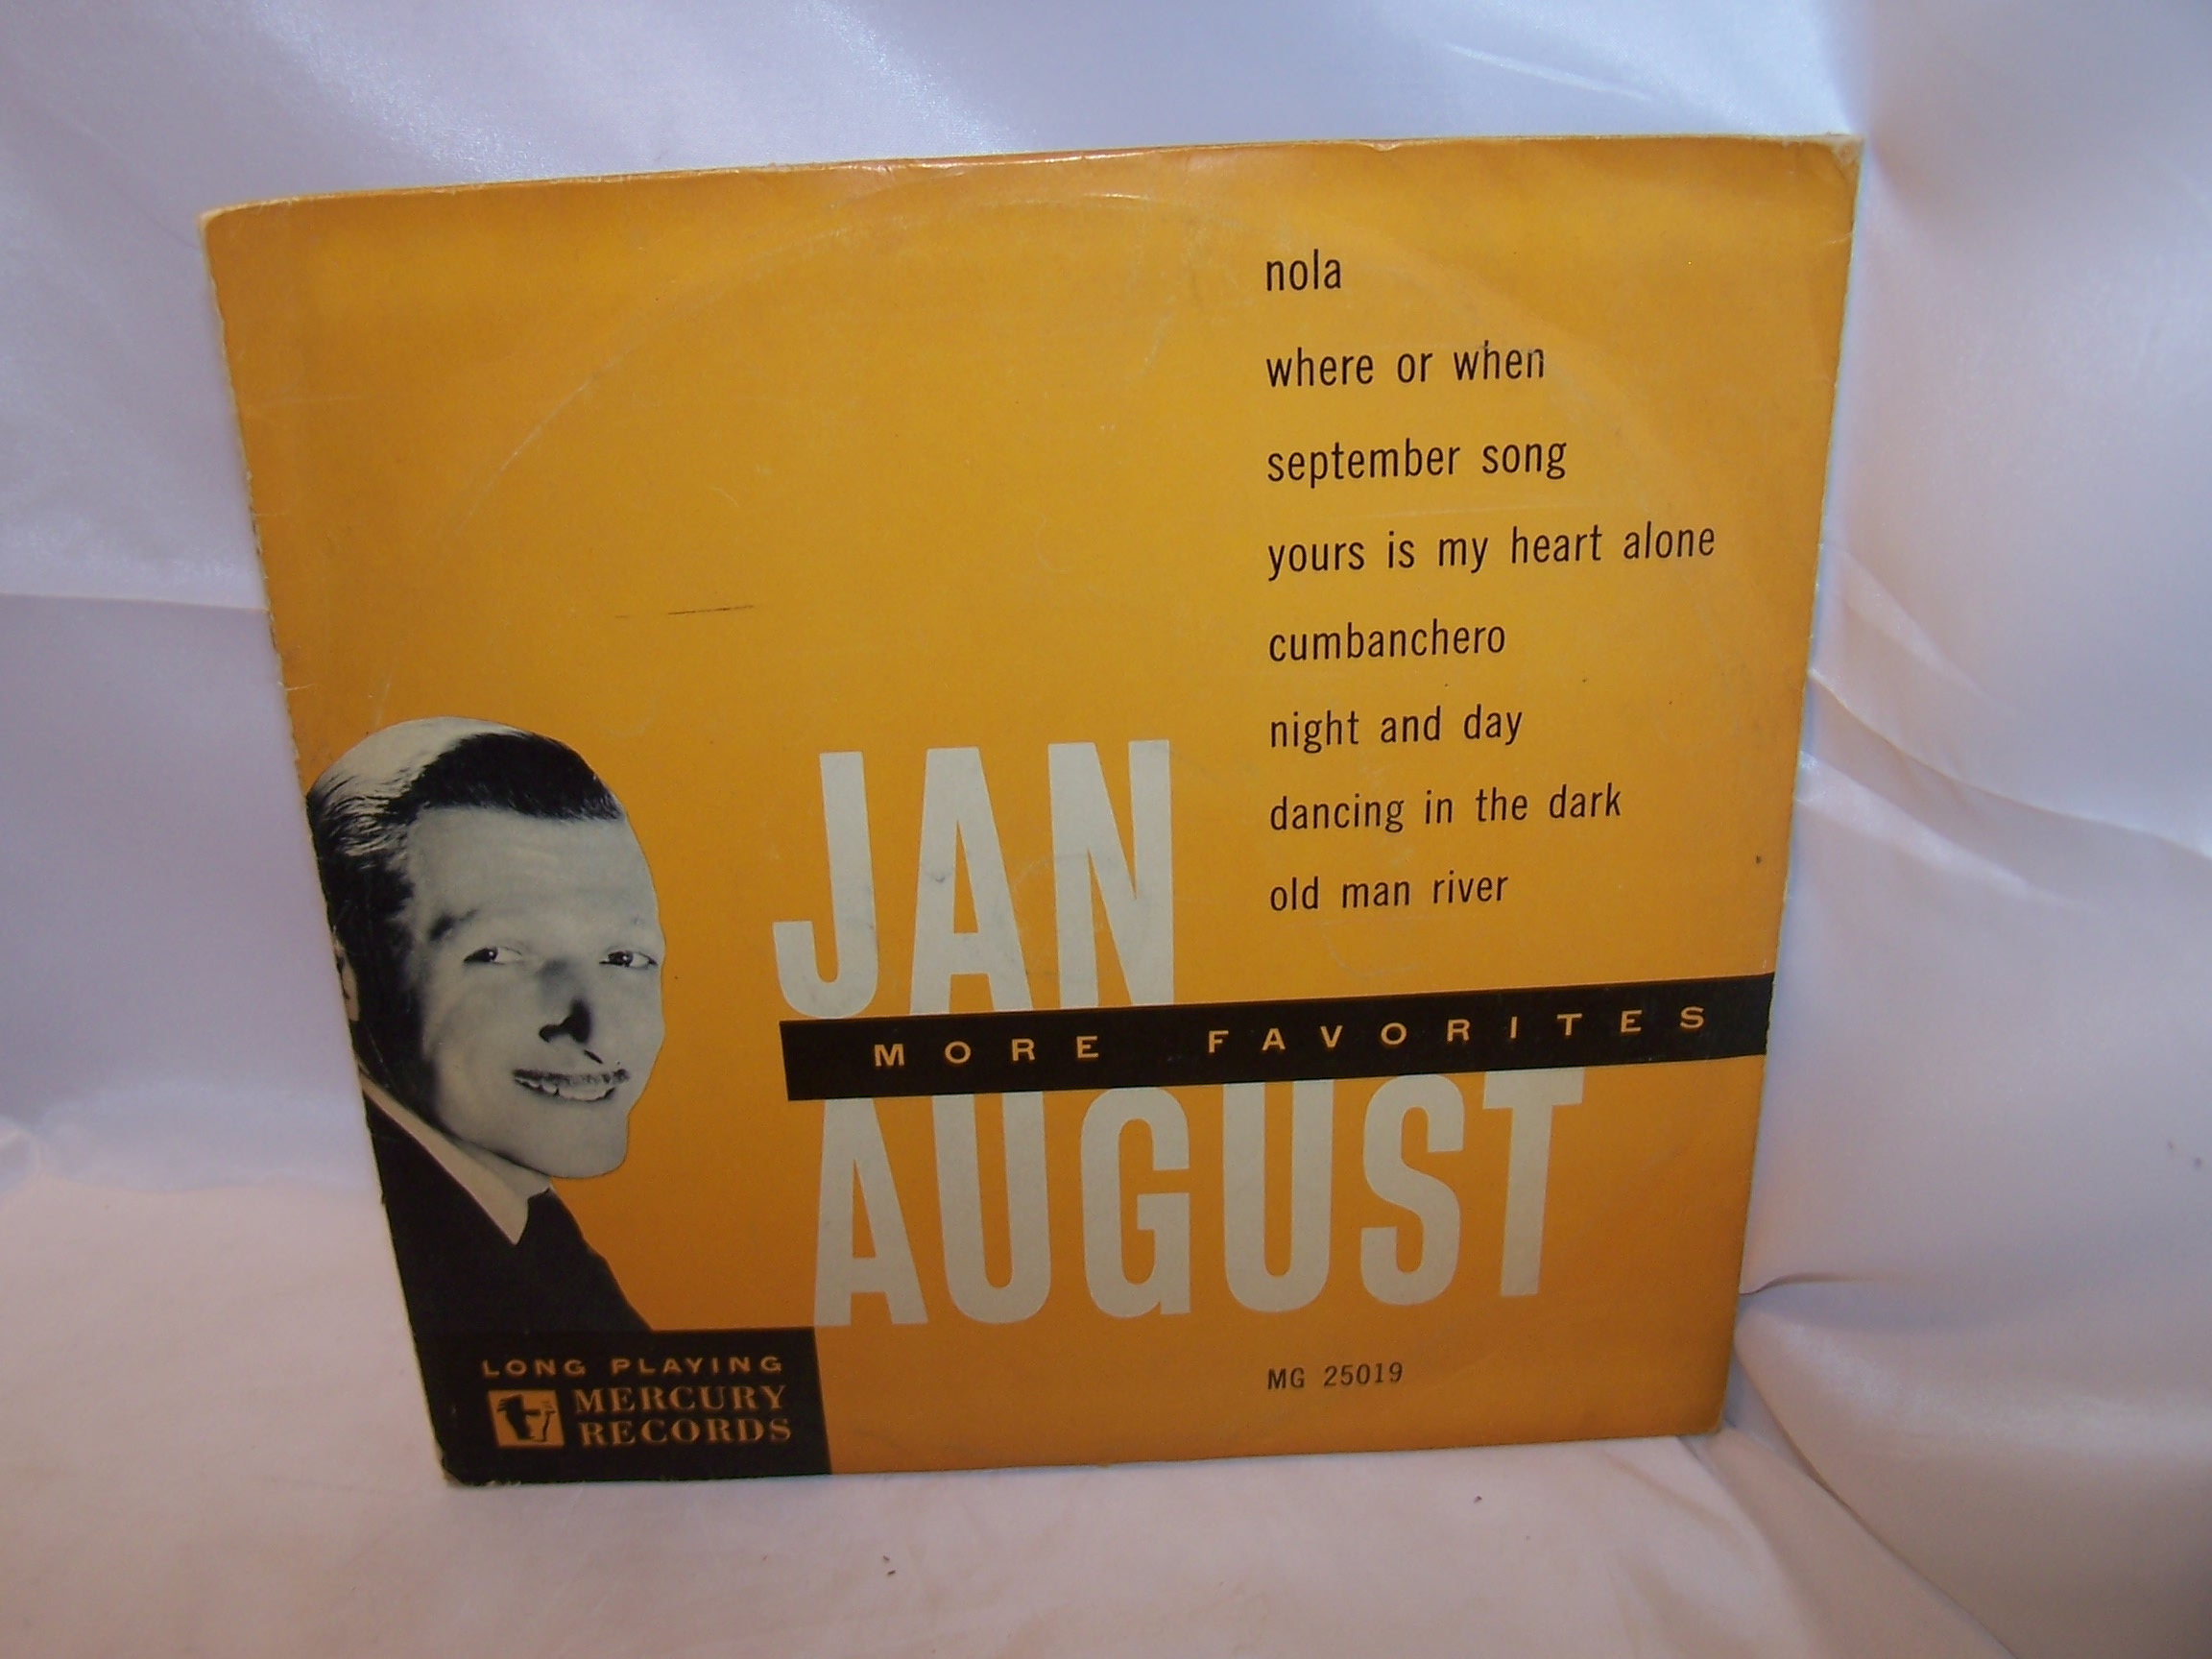 Jan August, More Favorites, LP Record, Mercury Records